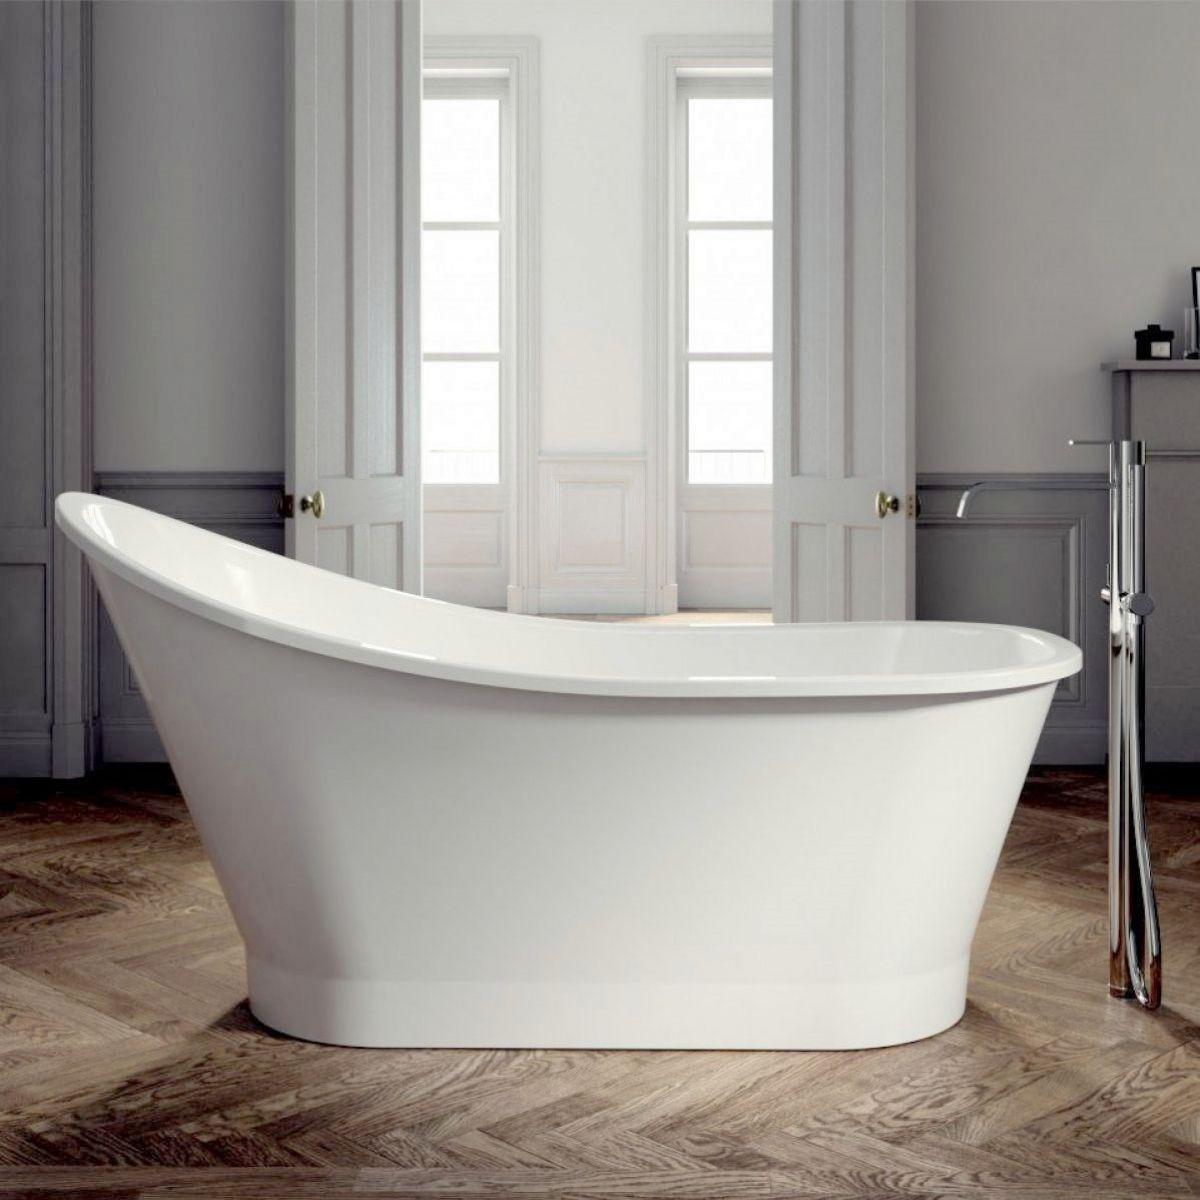 Slipper Bath Uk Ramsden mosley canna modern freestanding slipper bath uk bathrooms ramsden mosley canna modern freestanding slipper bath sisterspd